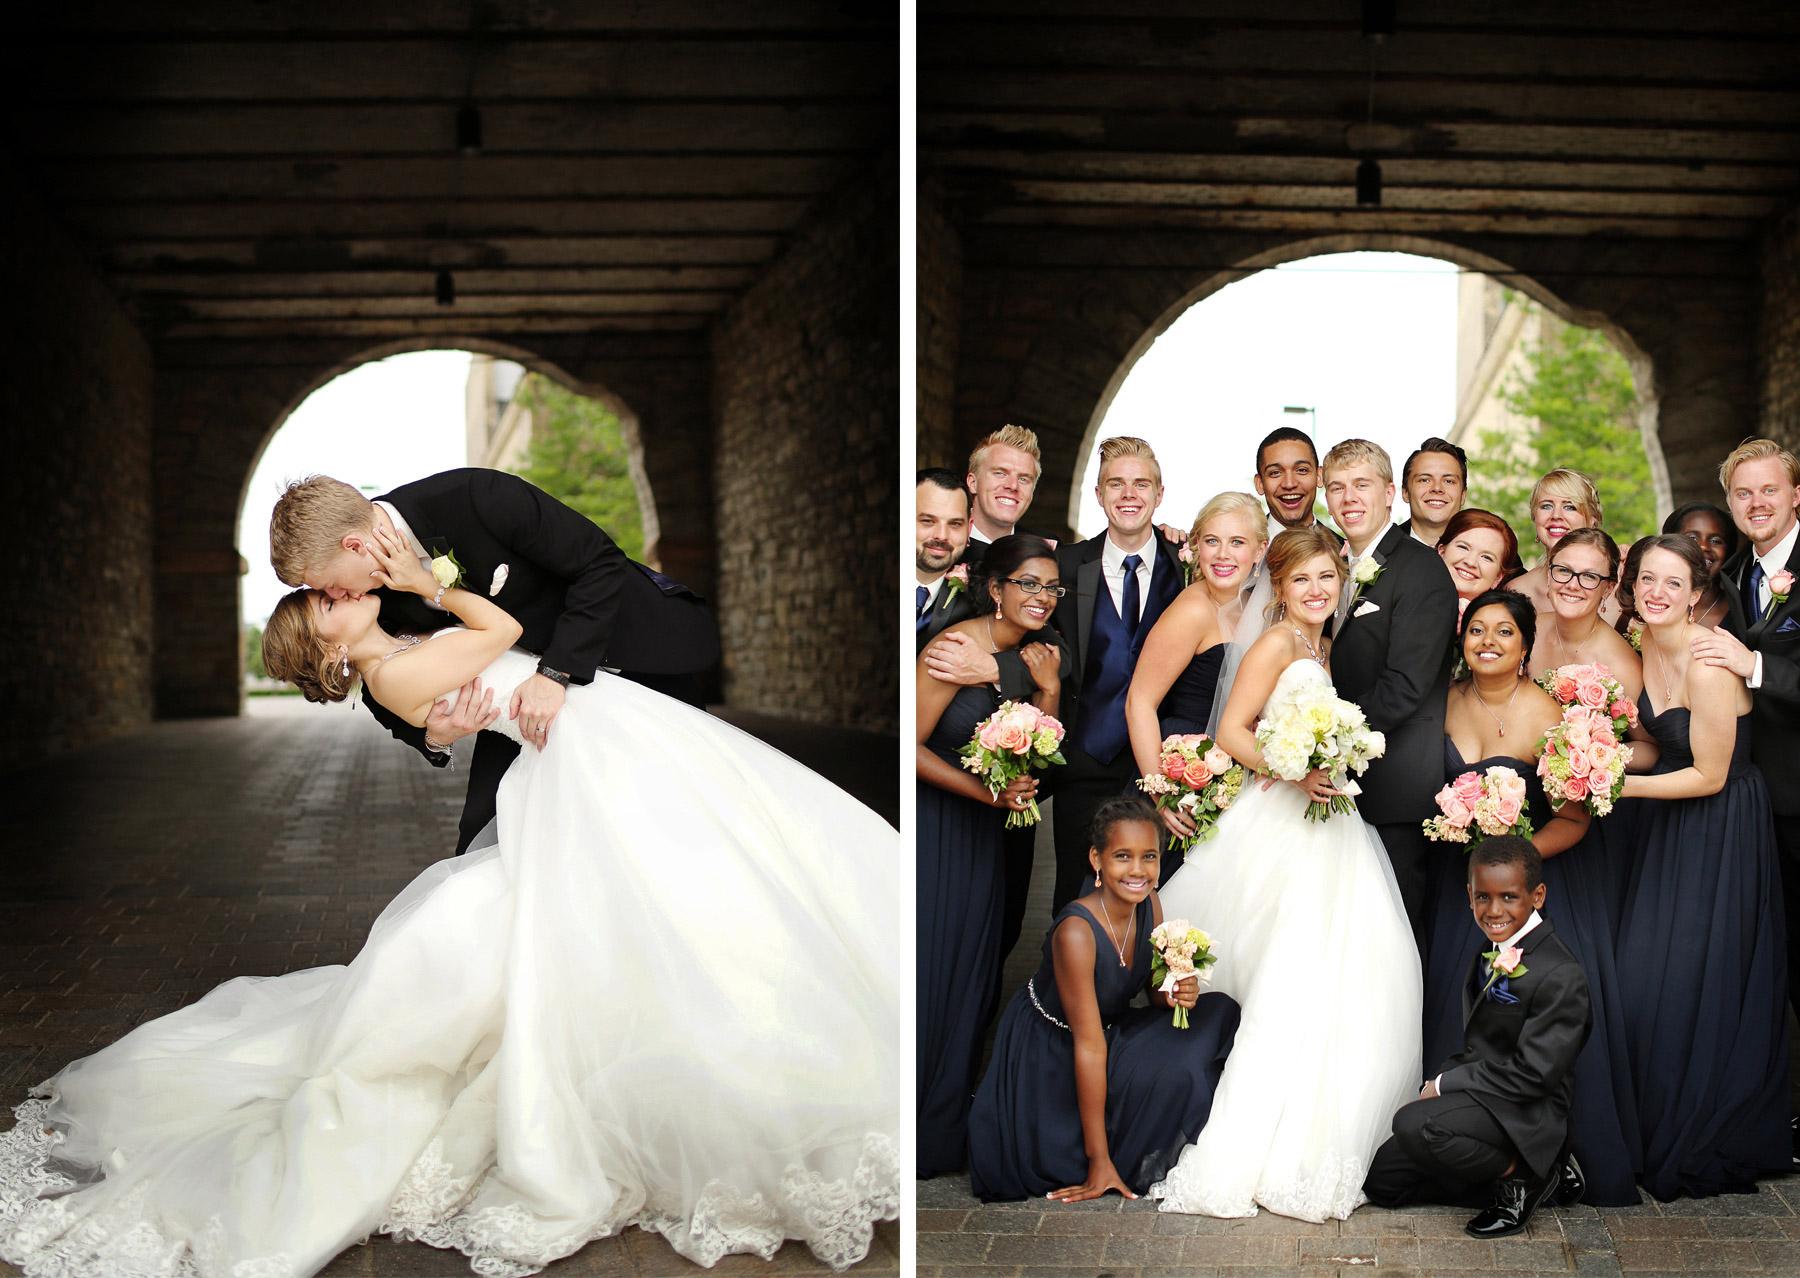 09-Minneapolis-Minnesota-Wedding-Photography-by-Vick-Photography-Wedding-Party-Courtney-&-John.jpg